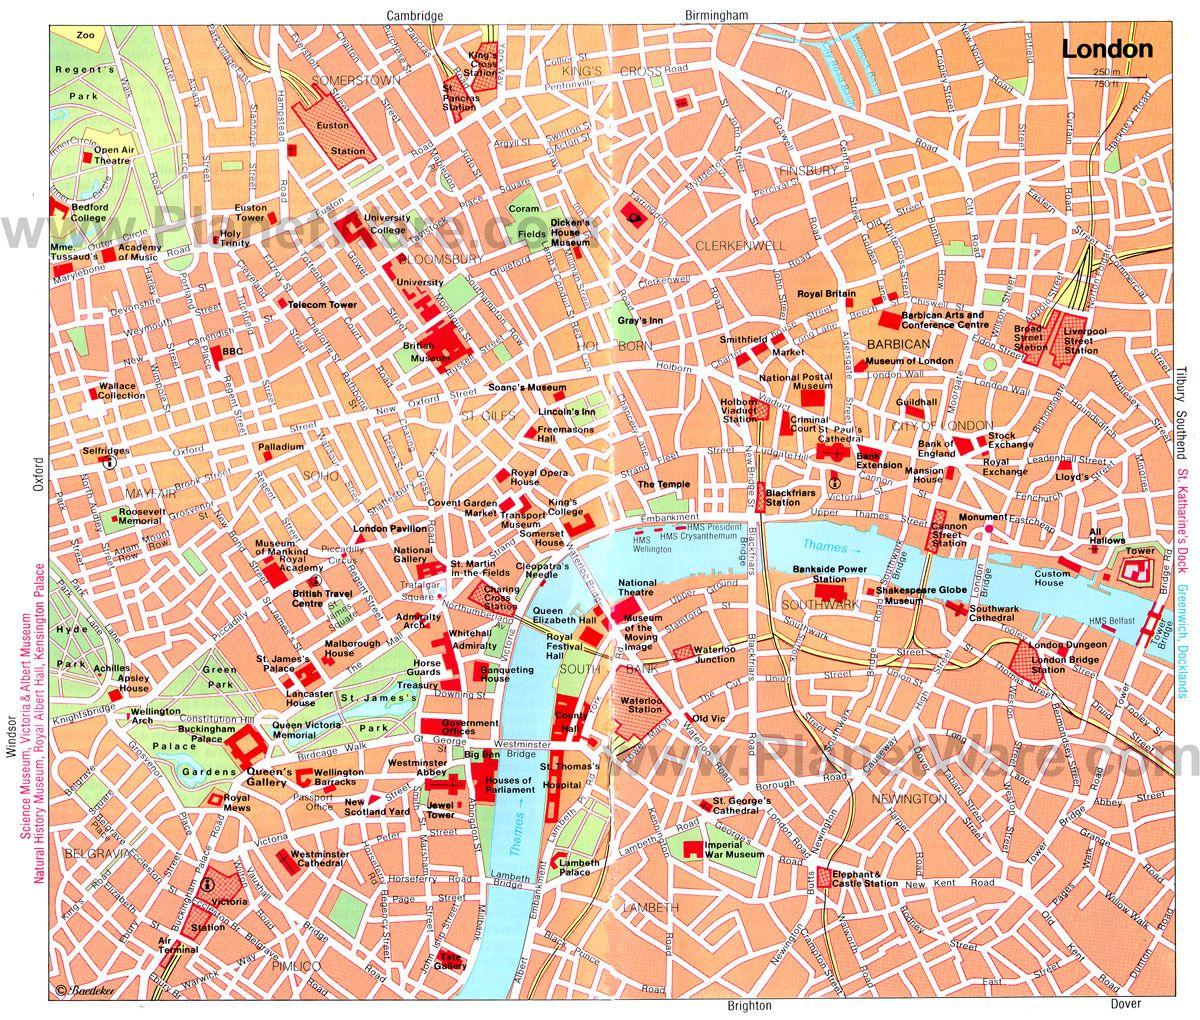 map of london city  london map england europe travel map  - map of london city  london map england europe travel map – tourist